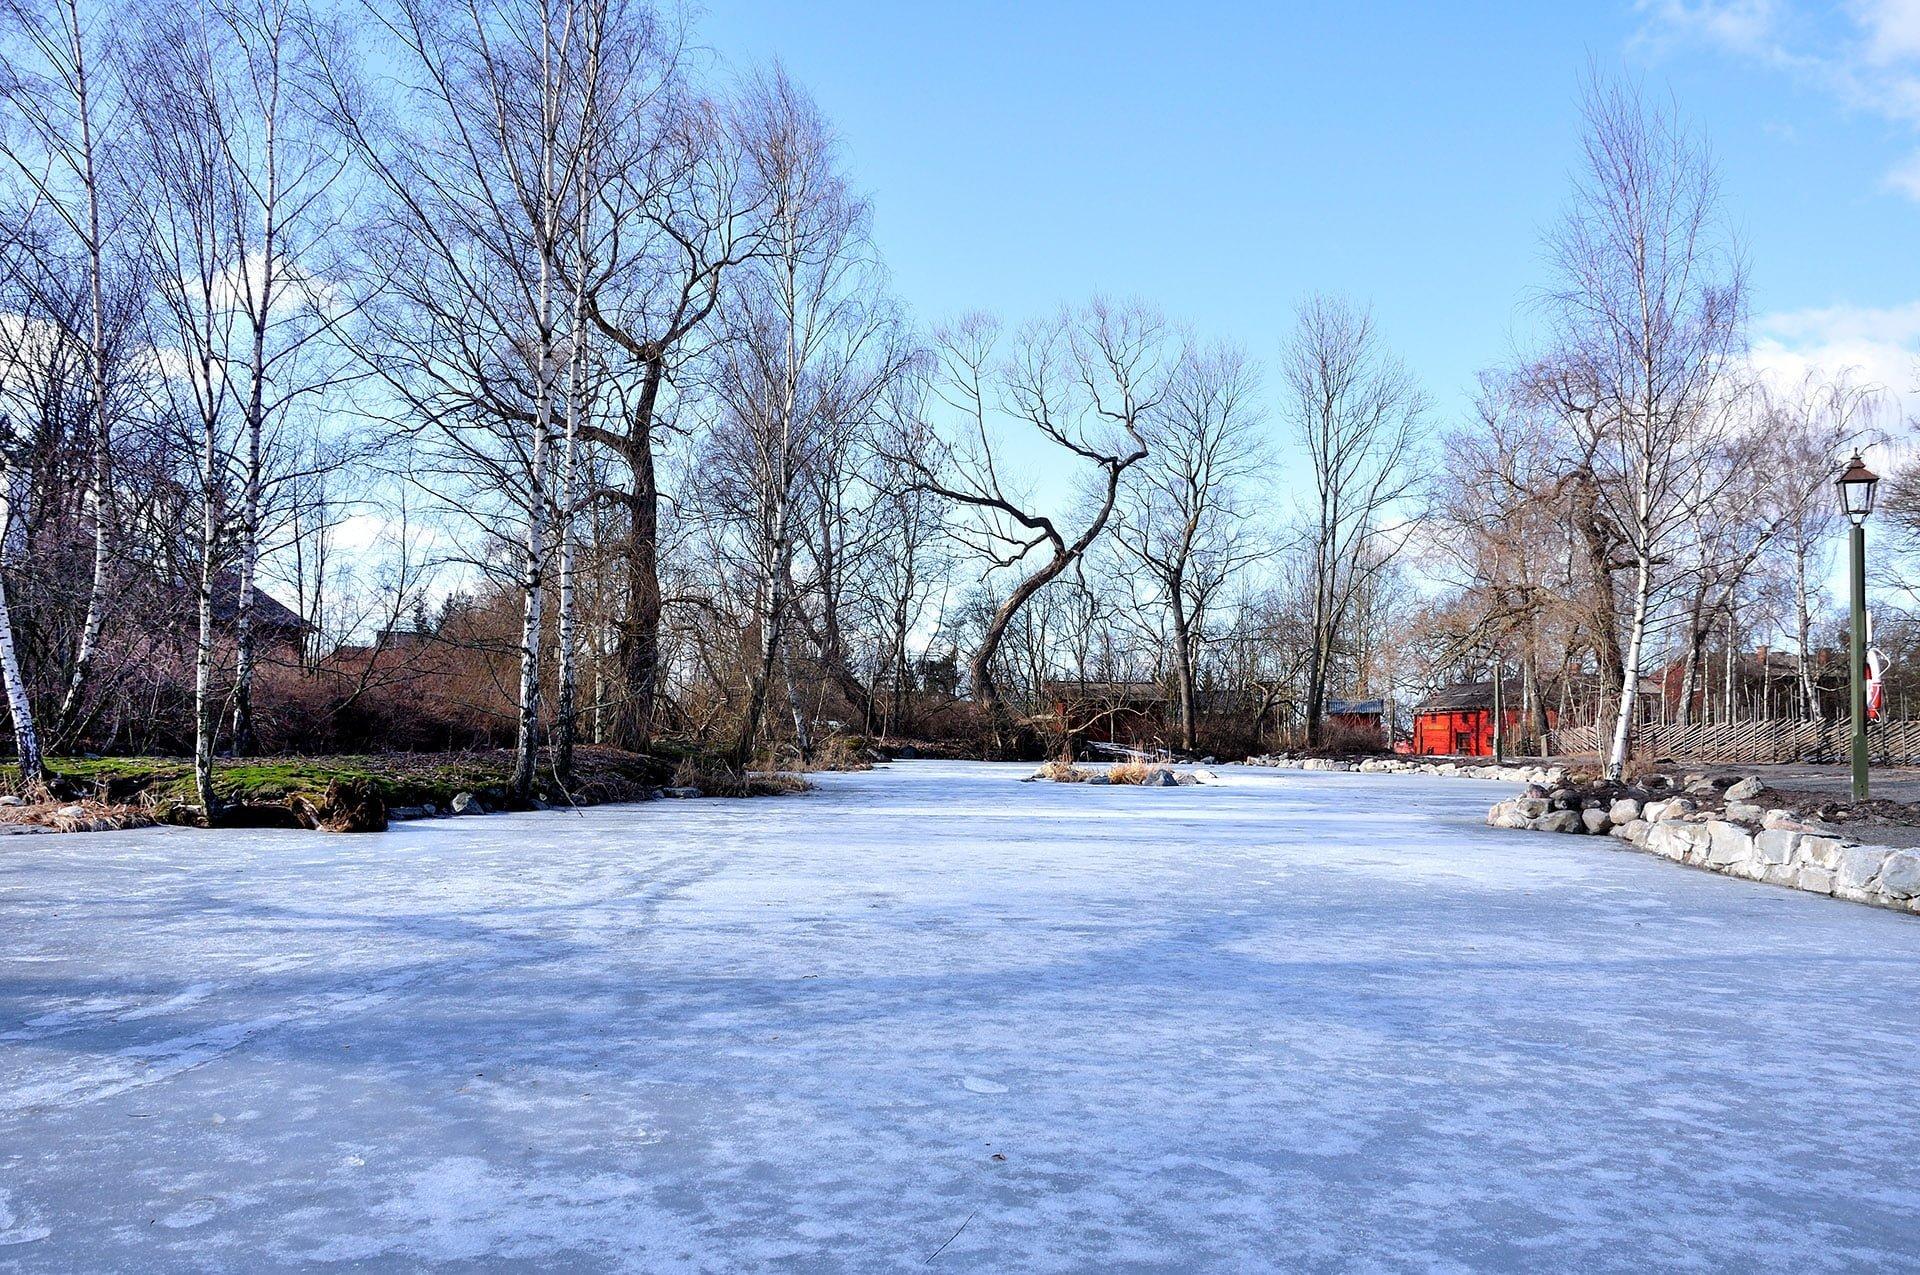 skansen donmuş göl